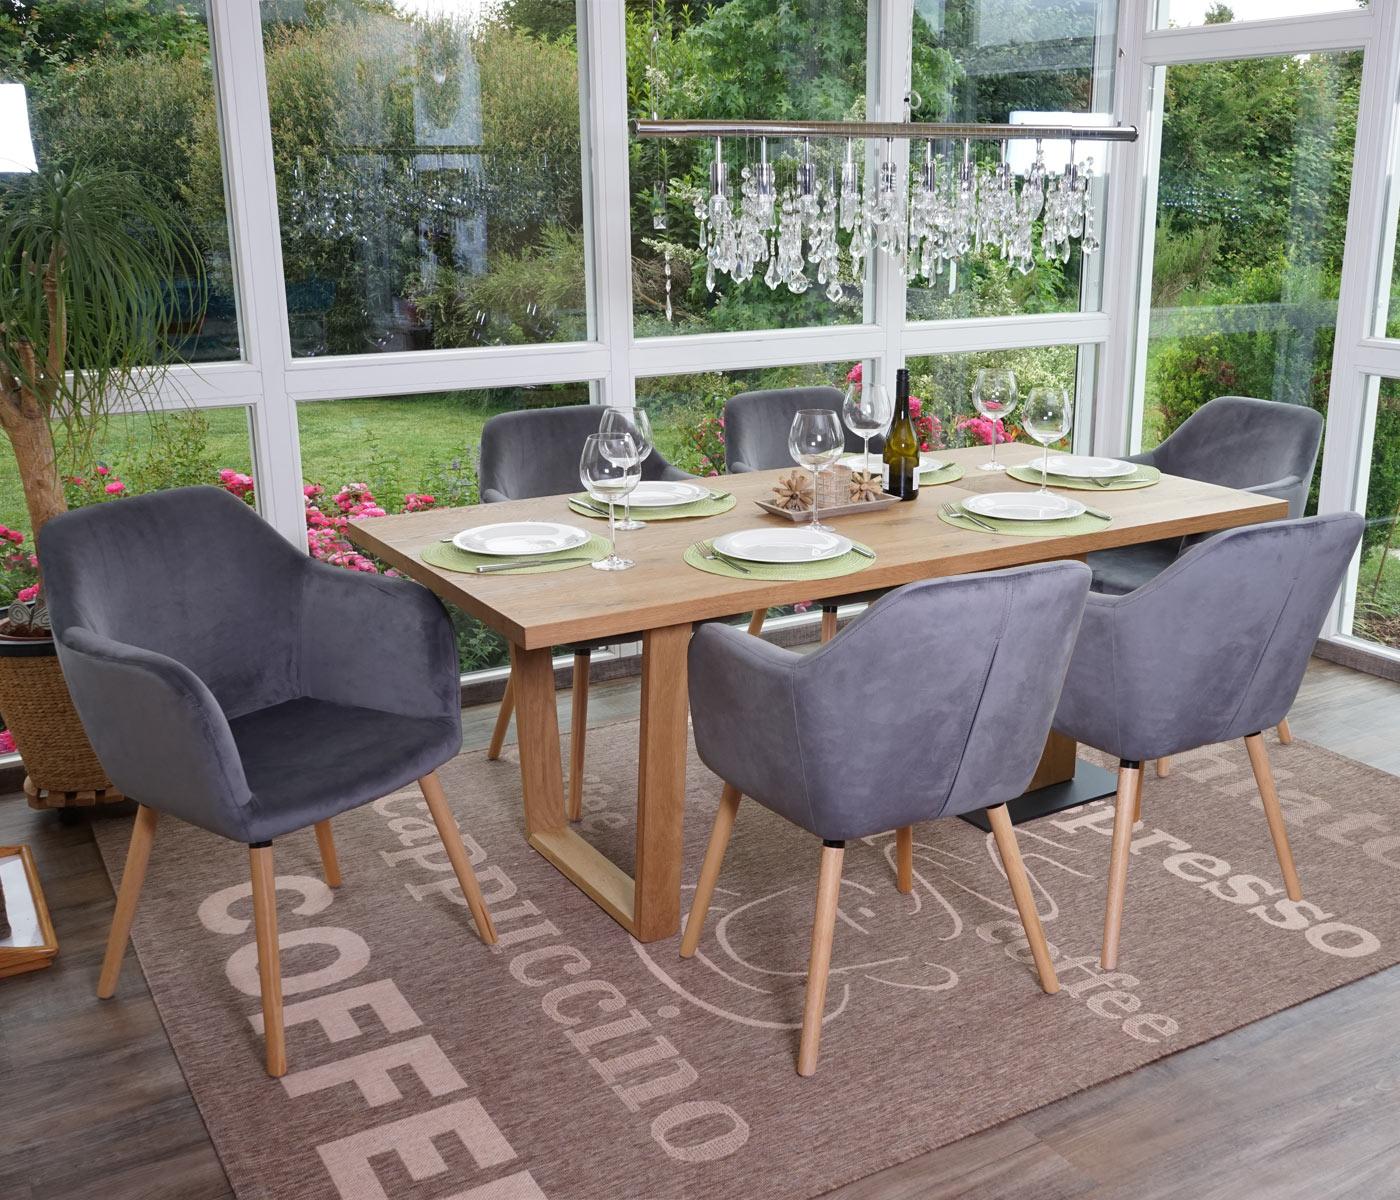 6x esszimmerstuhl malm t381 stuhl lehnstuhl retro 50er jahre design samt grau. Black Bedroom Furniture Sets. Home Design Ideas